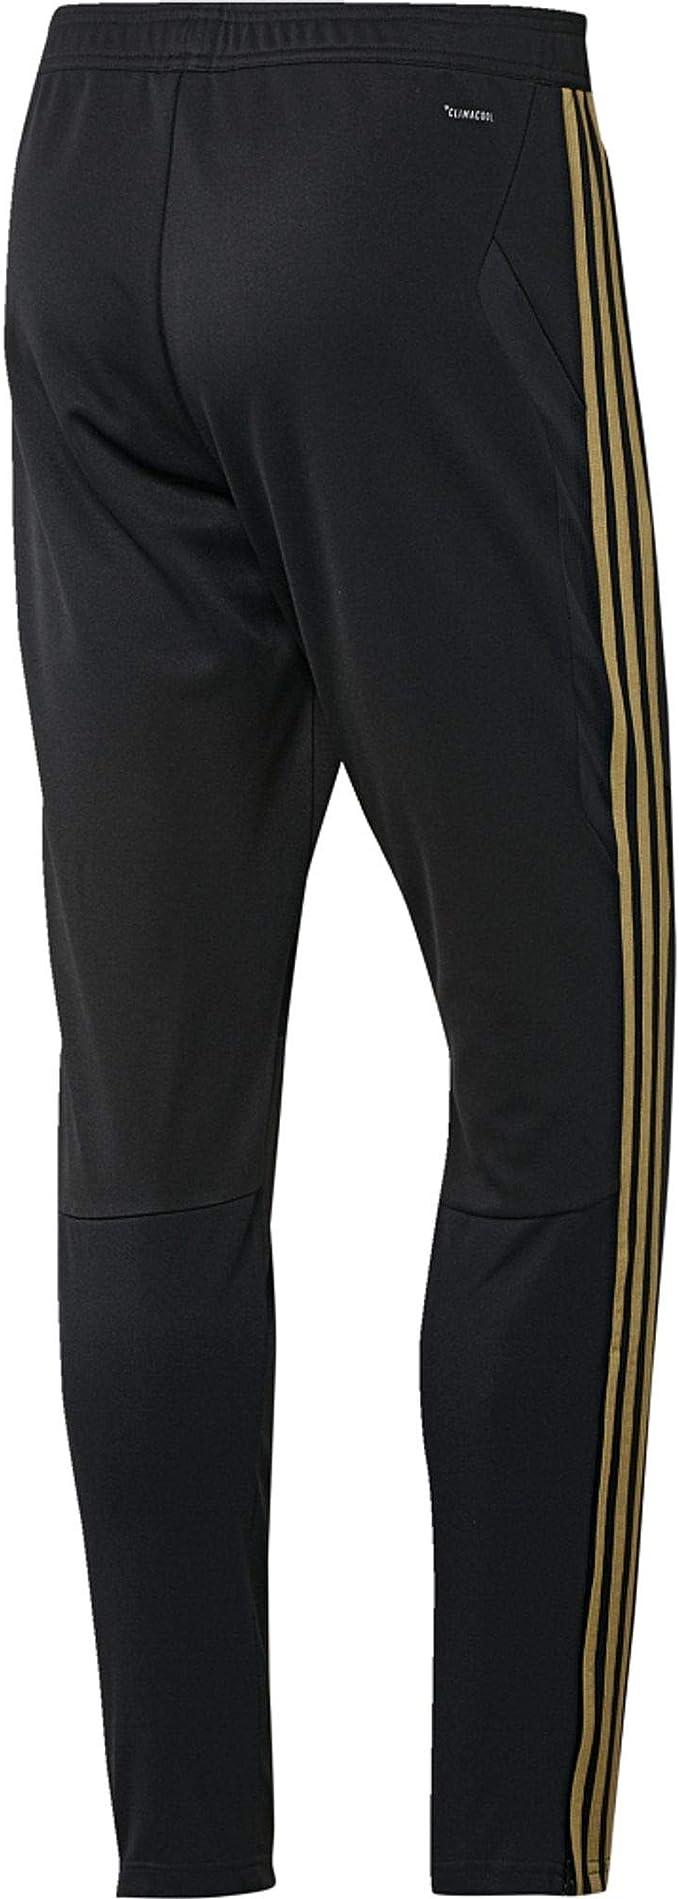 adidas Real Madrid Training Pants Pantalón Largo, Unisex Adulto ...